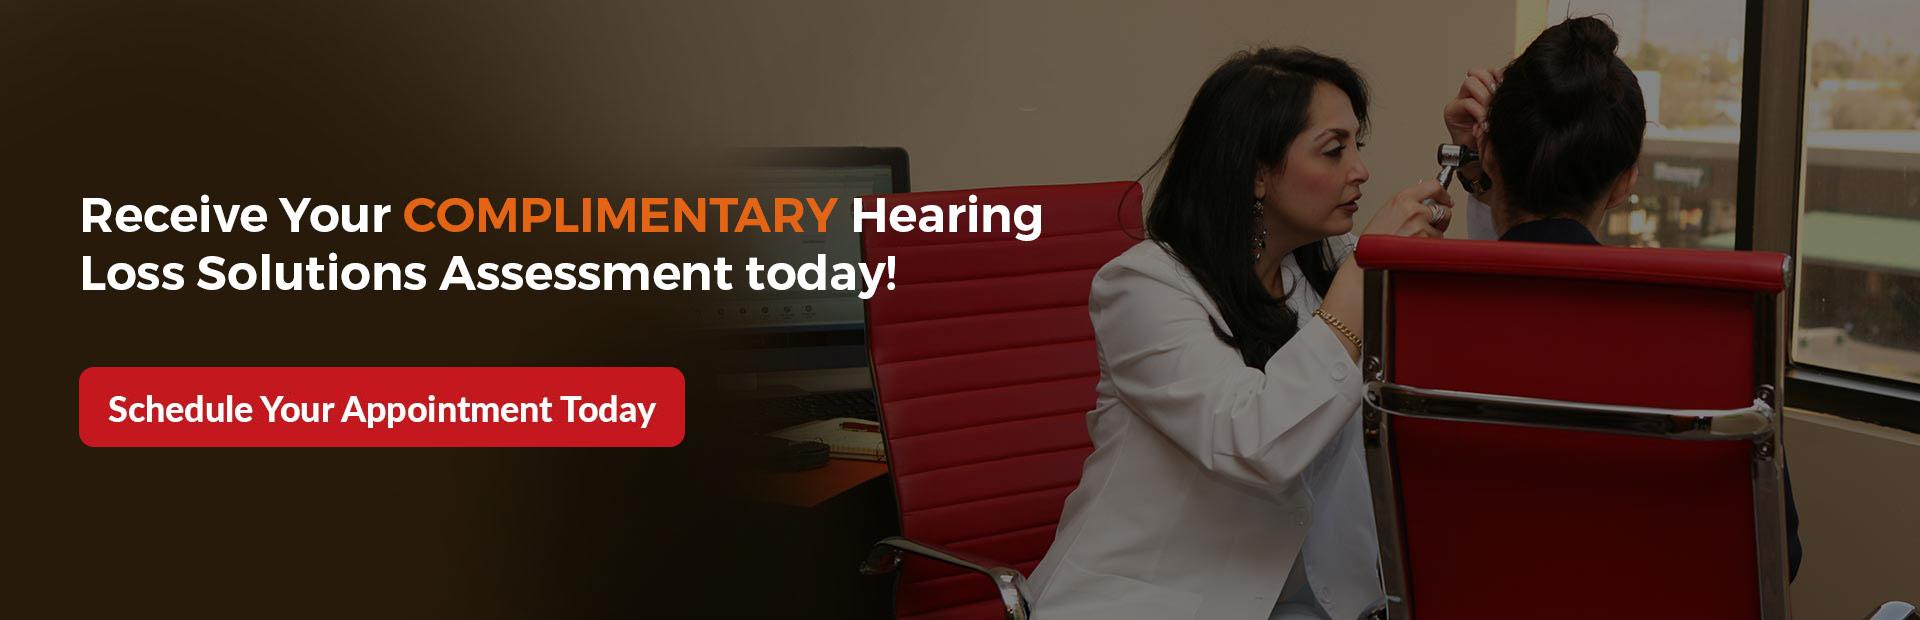 complimentary hearing assessment in sherman oaks ca